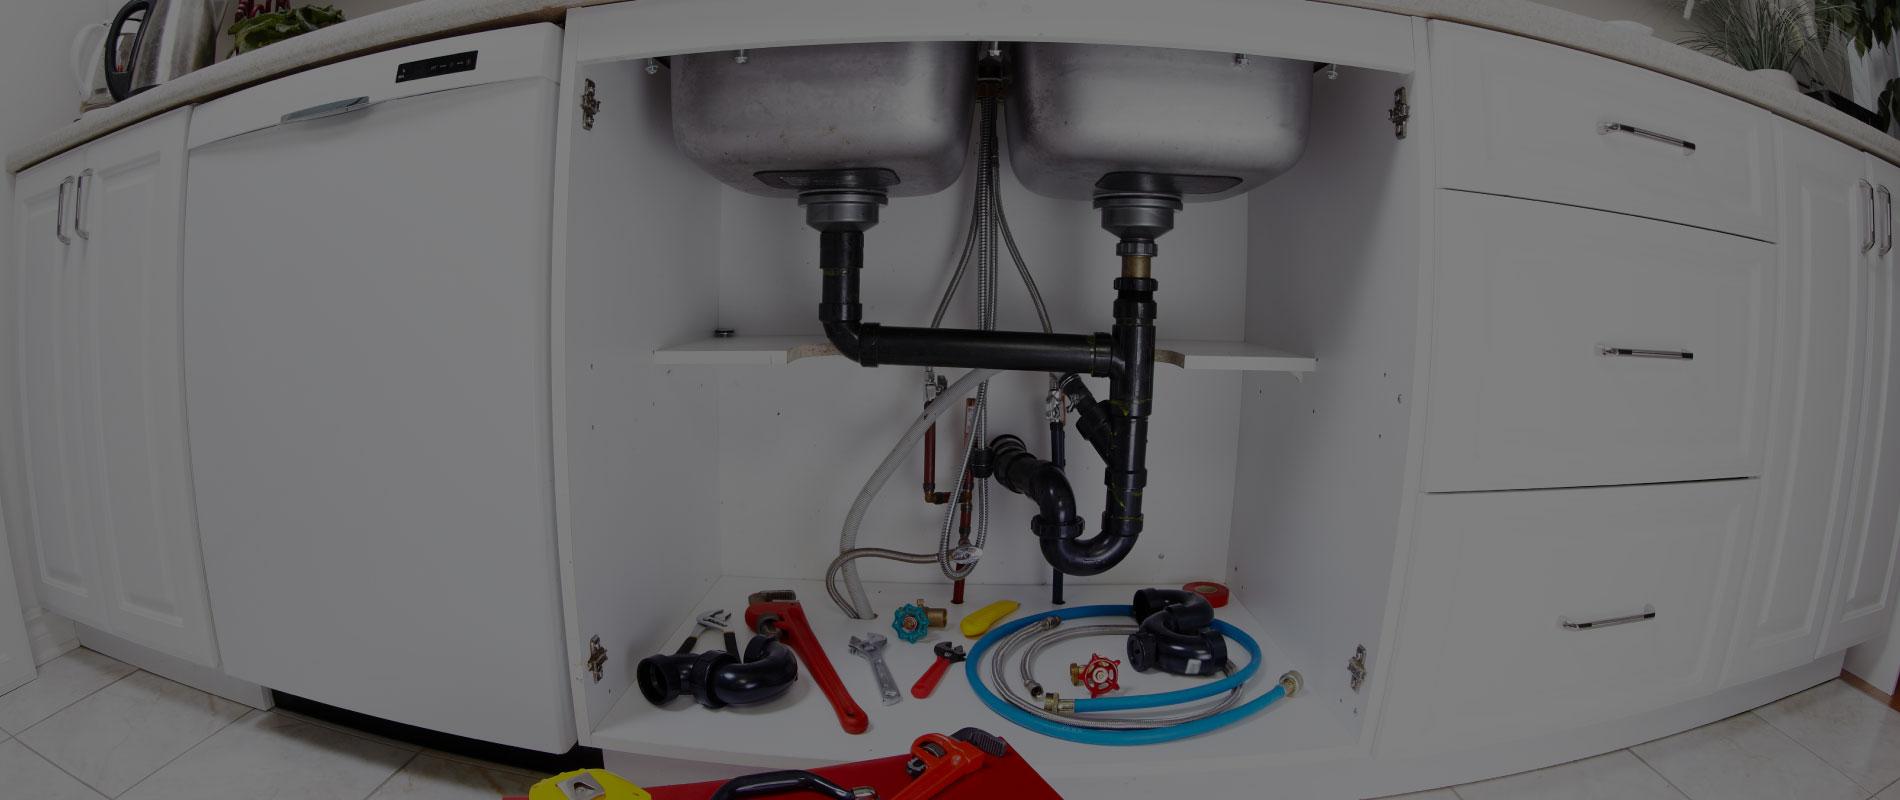 plumbing accidents